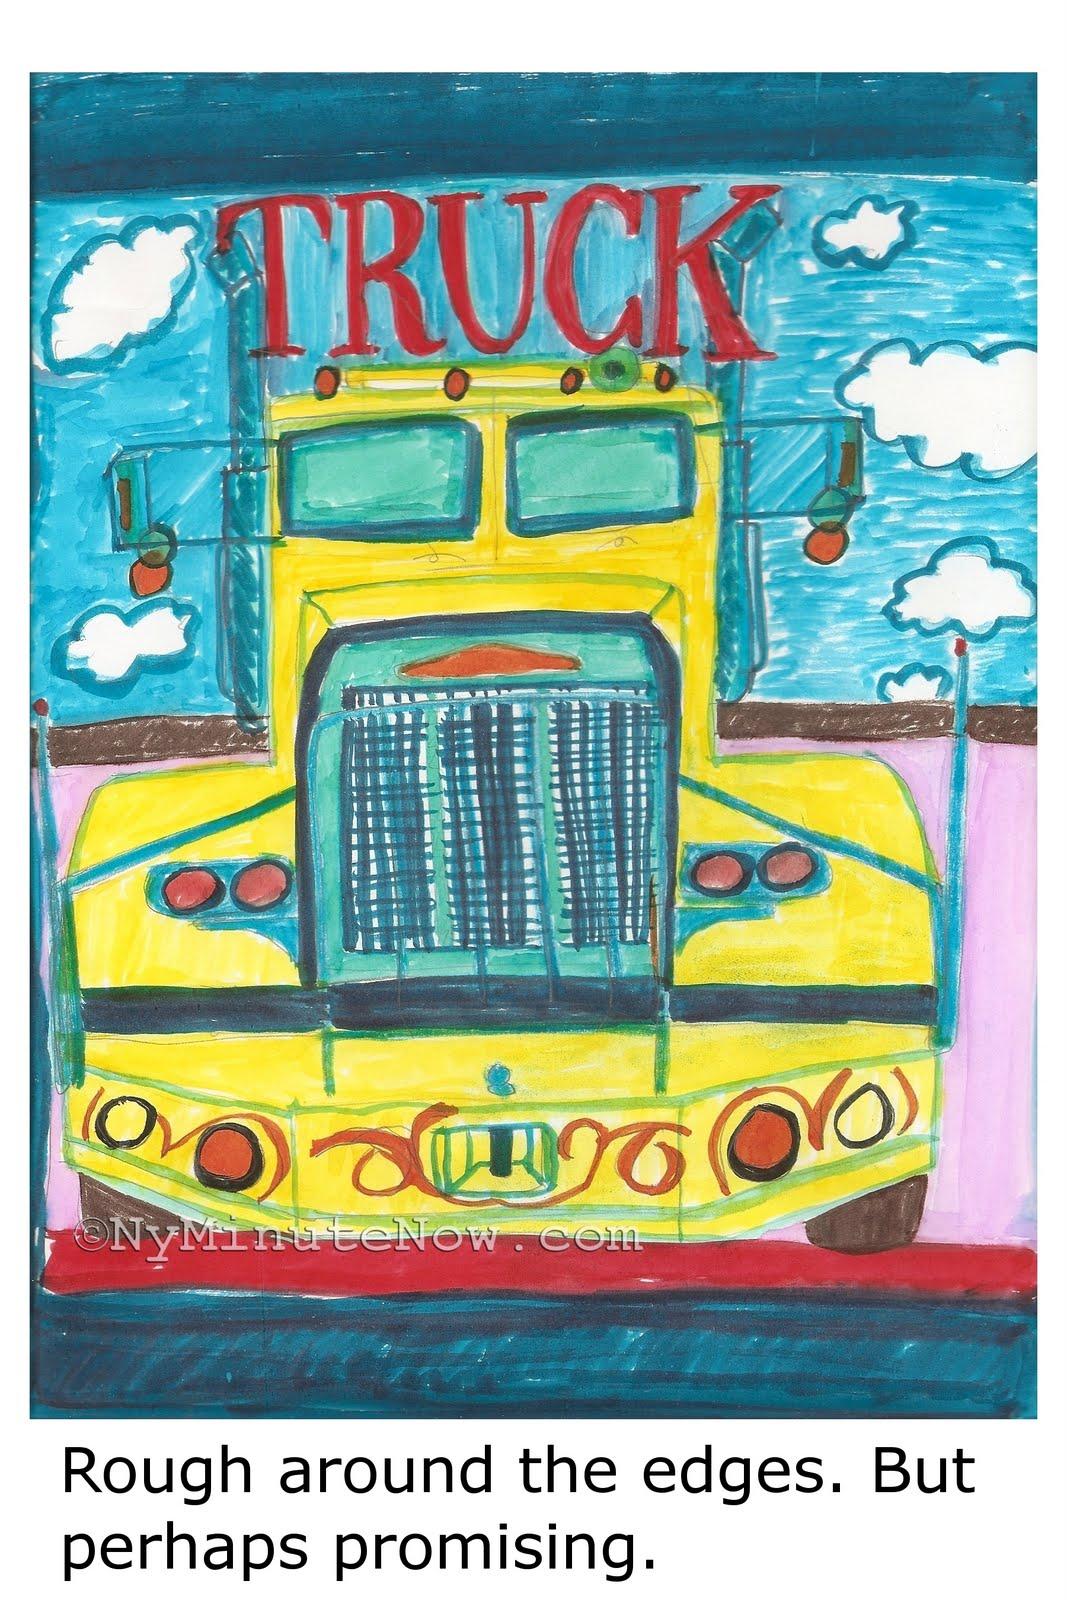 [mariel+chua+nyminutenow+truck+painting+caption01+watermark2.jpg]